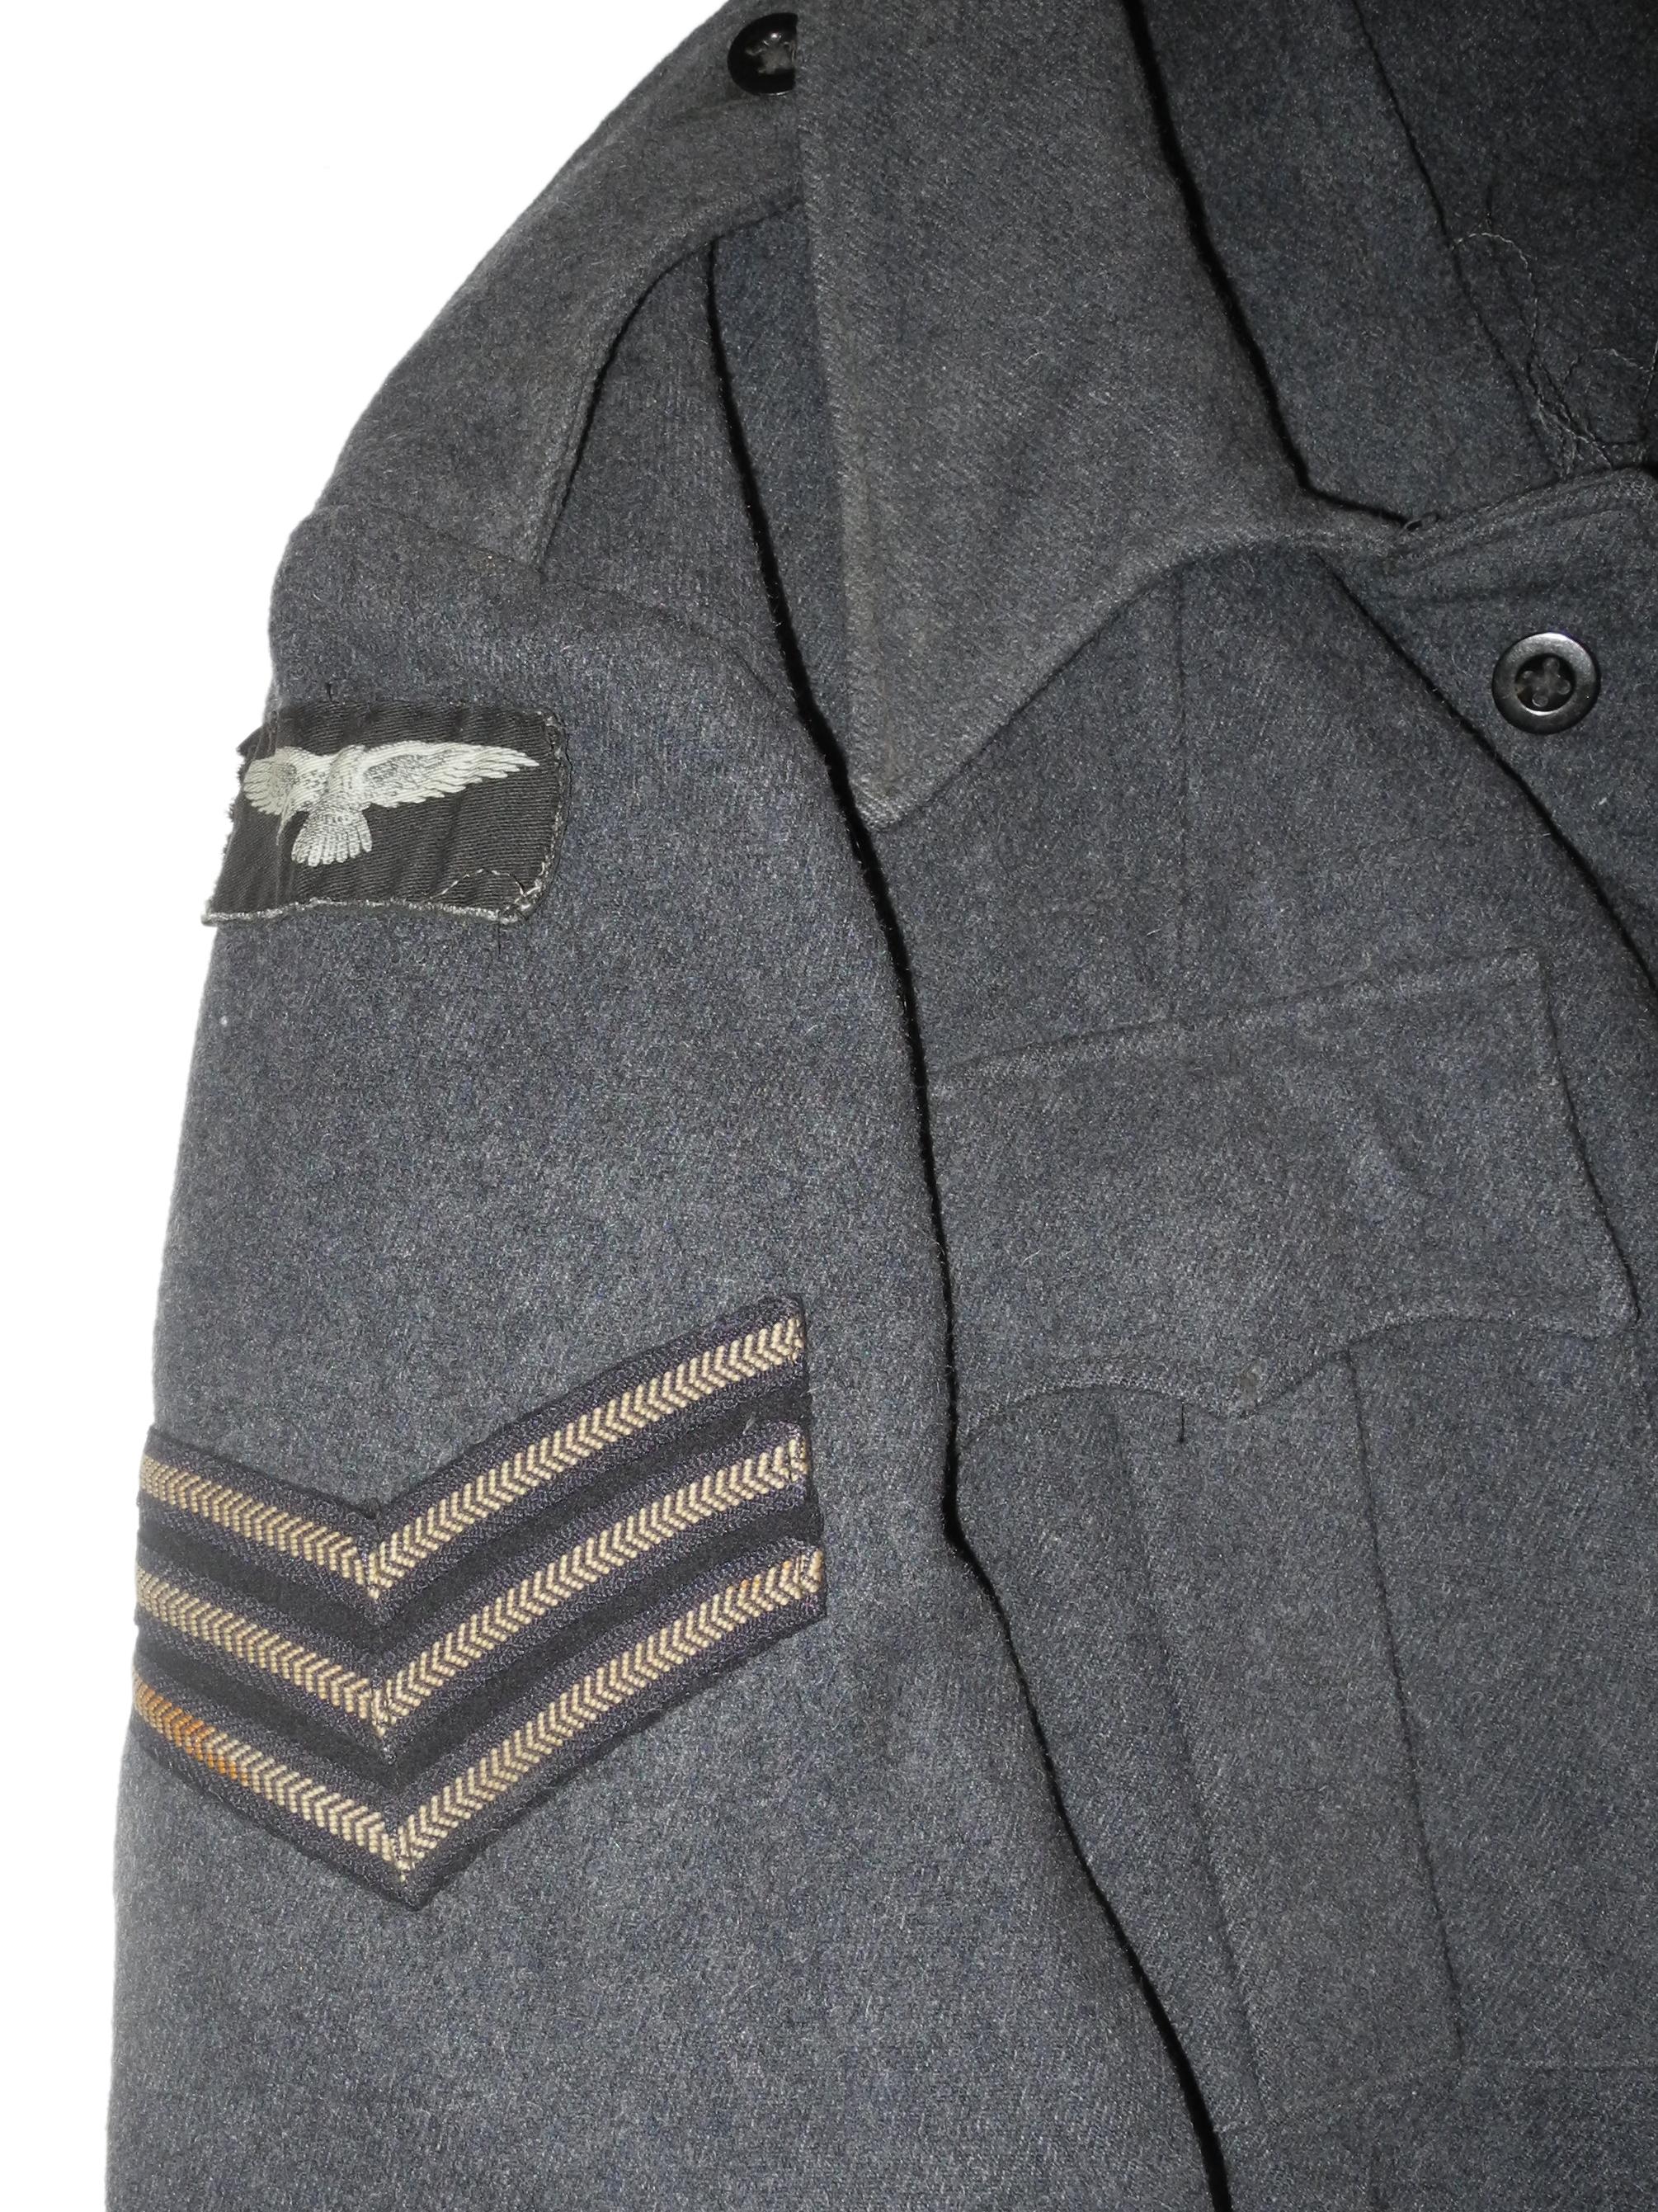 RAF War Service Dress BD blouse